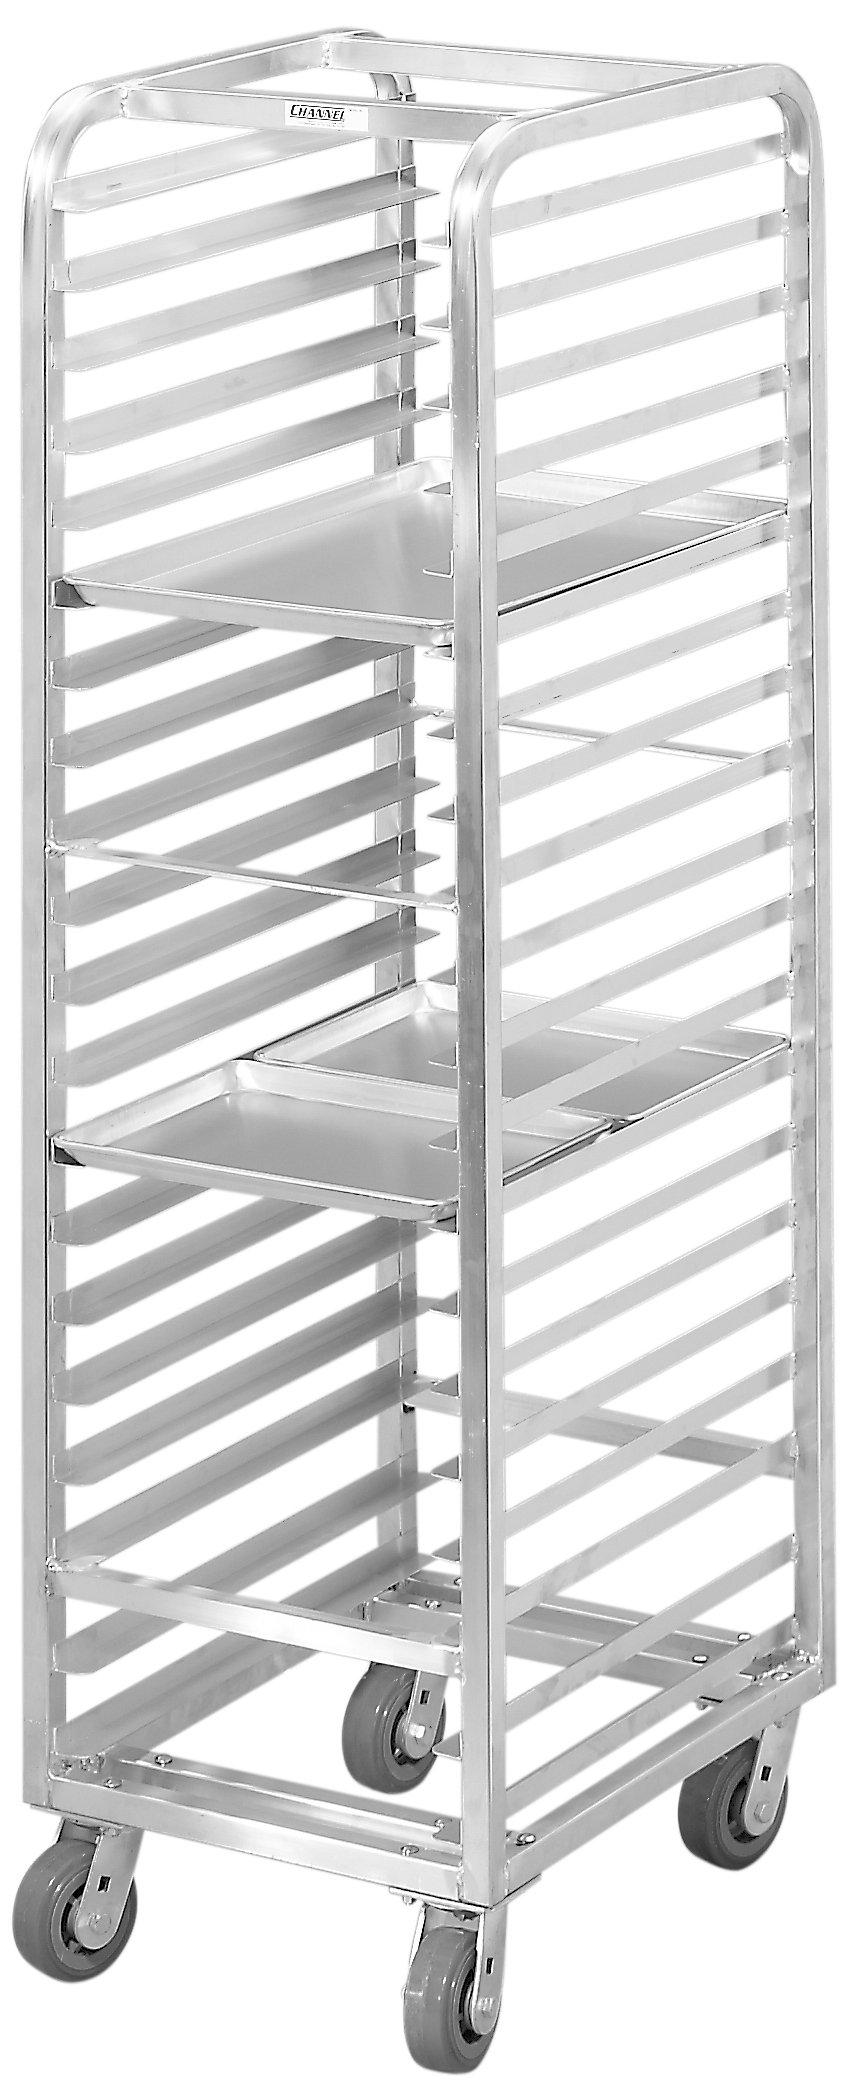 Channel Manufacturing AXD1808 Bun Pan Rack